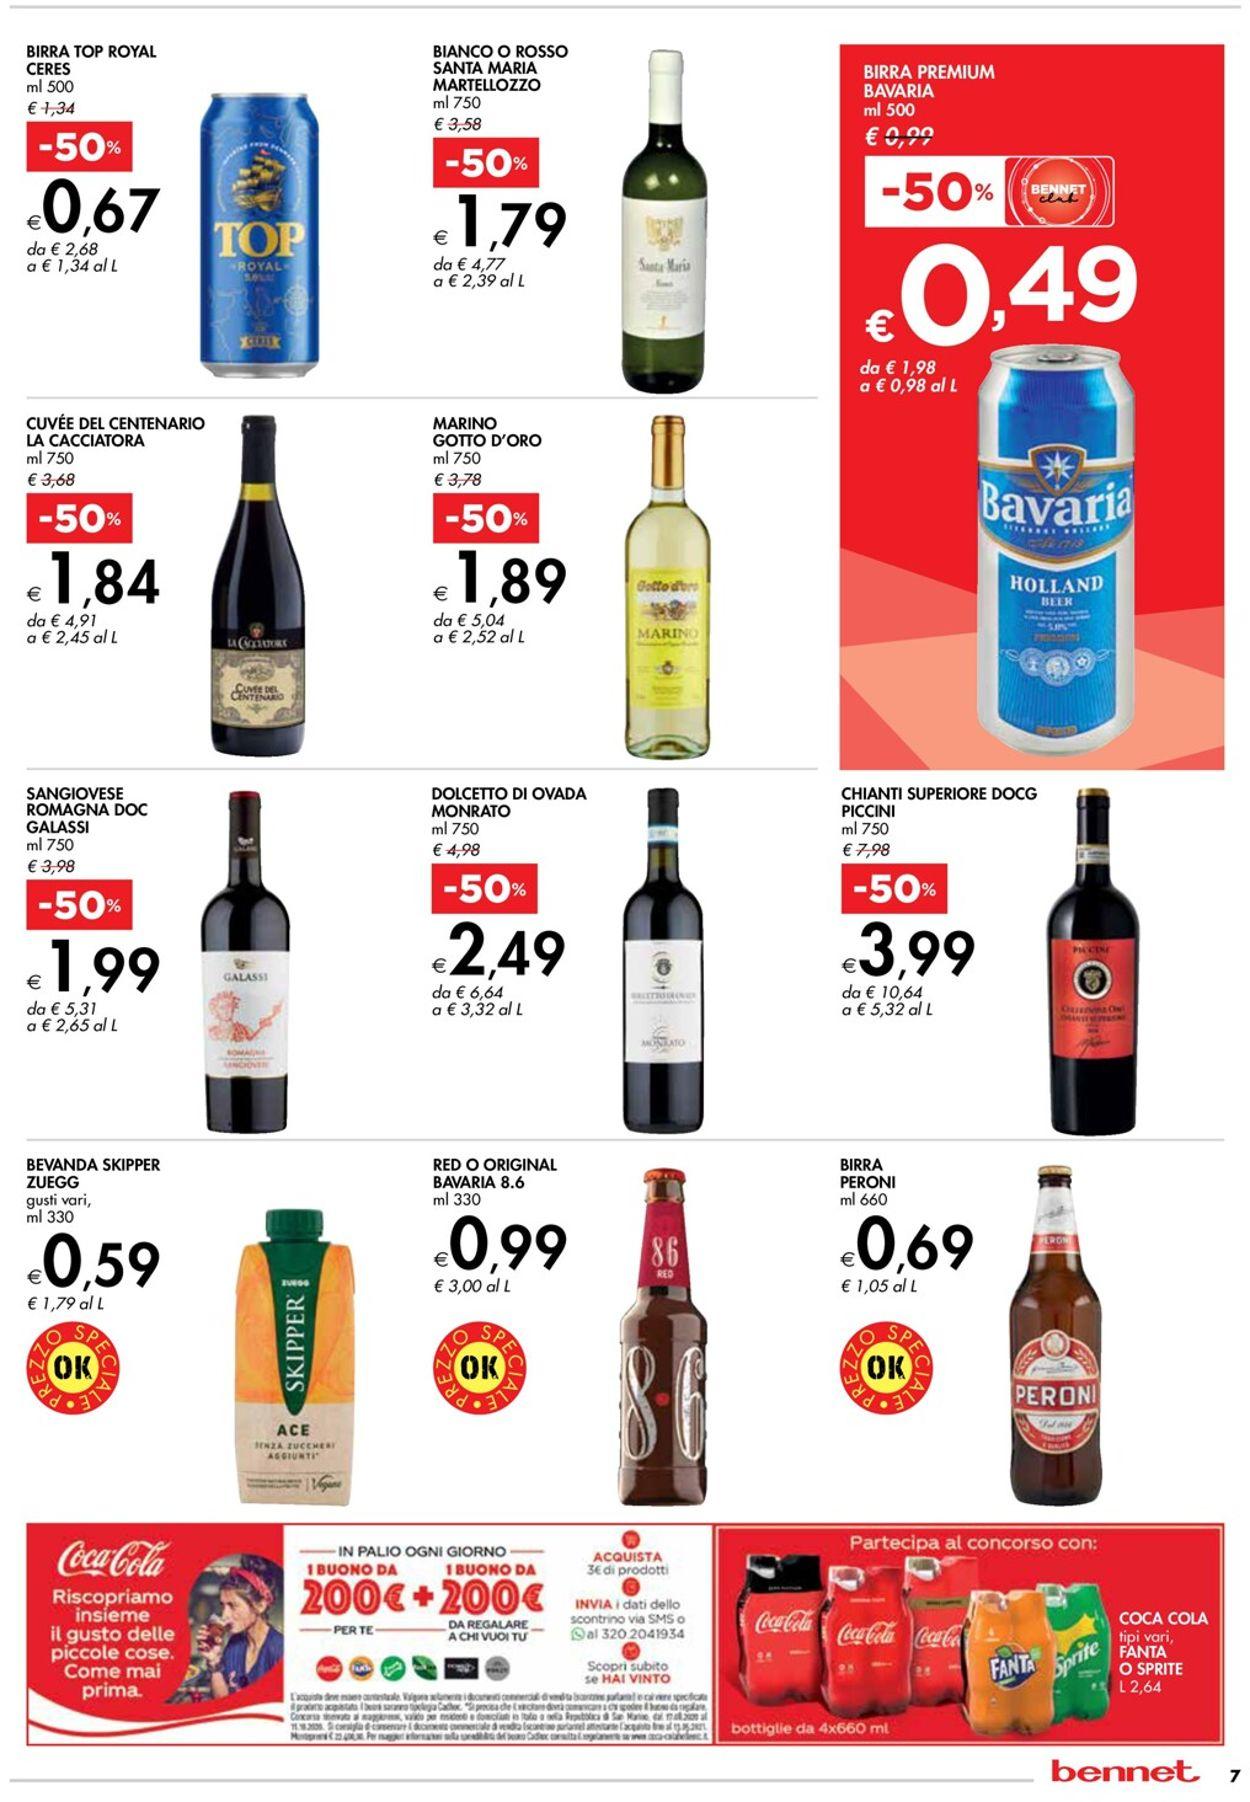 Volantino bennet - Offerte 17/09-30/09/2020 (Pagina 7)